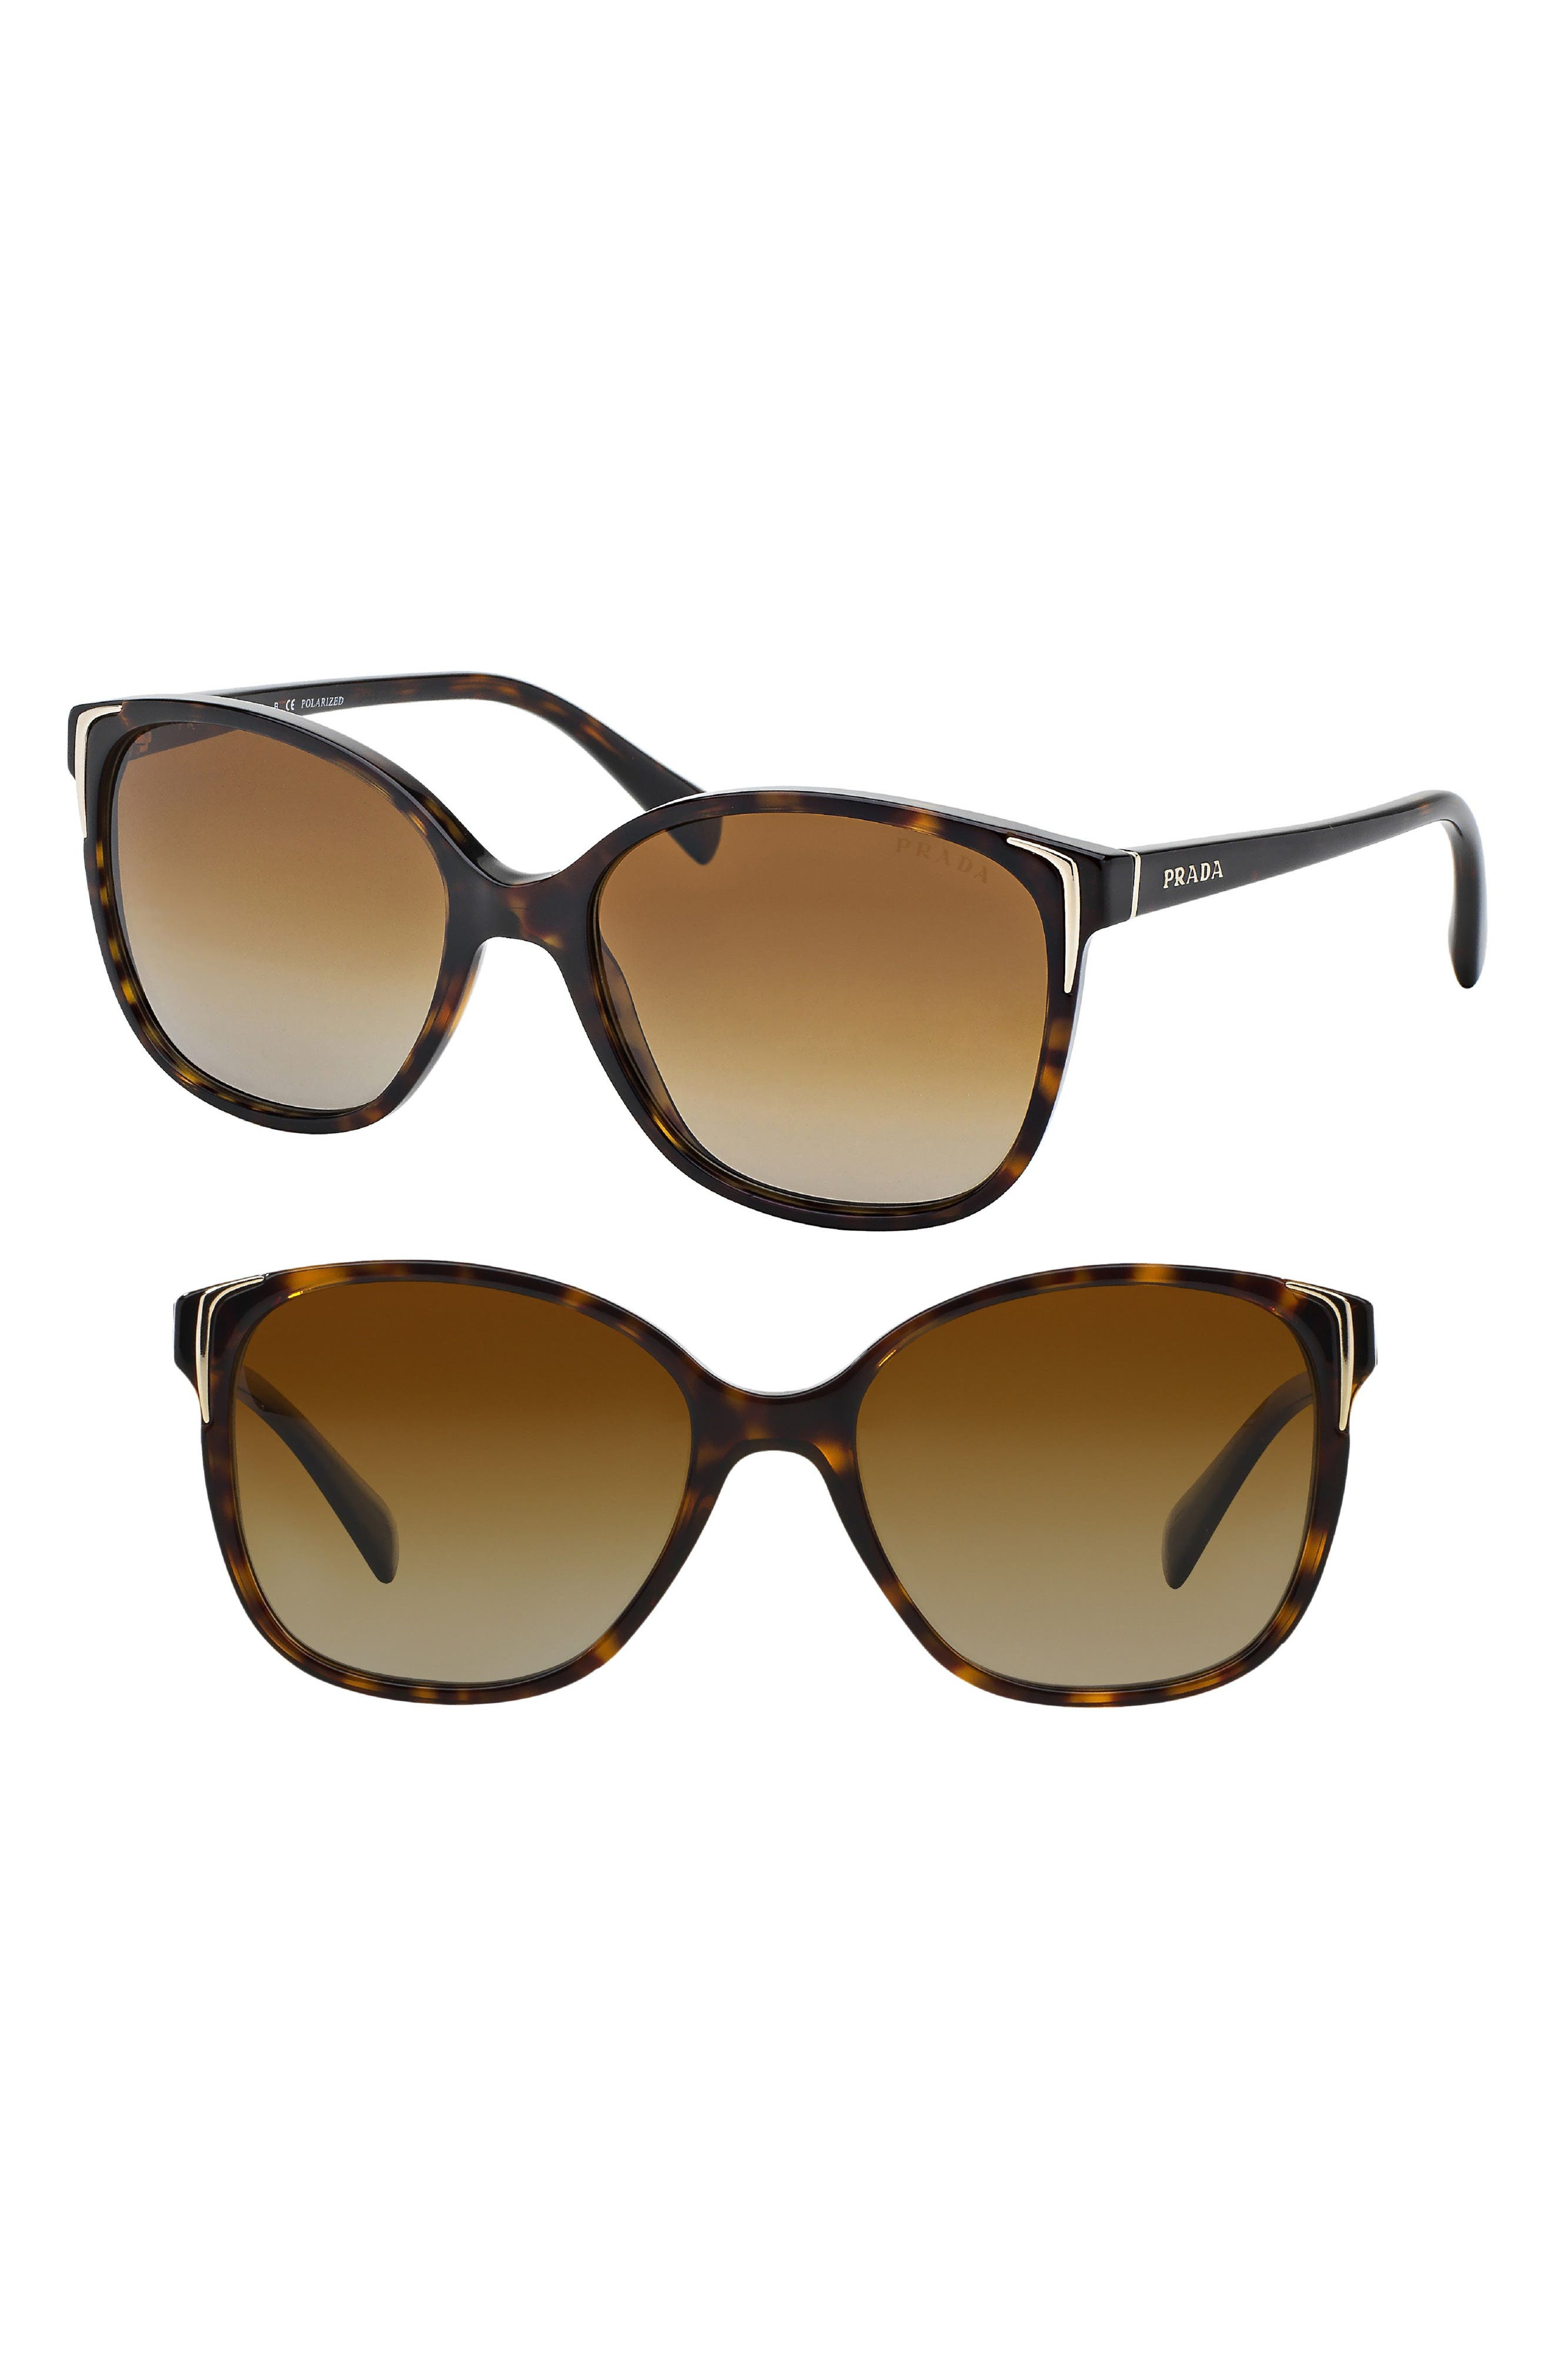 55mm Polarized Cat Eye Sunglasses,                             Main thumbnail 1, color,                             Havana